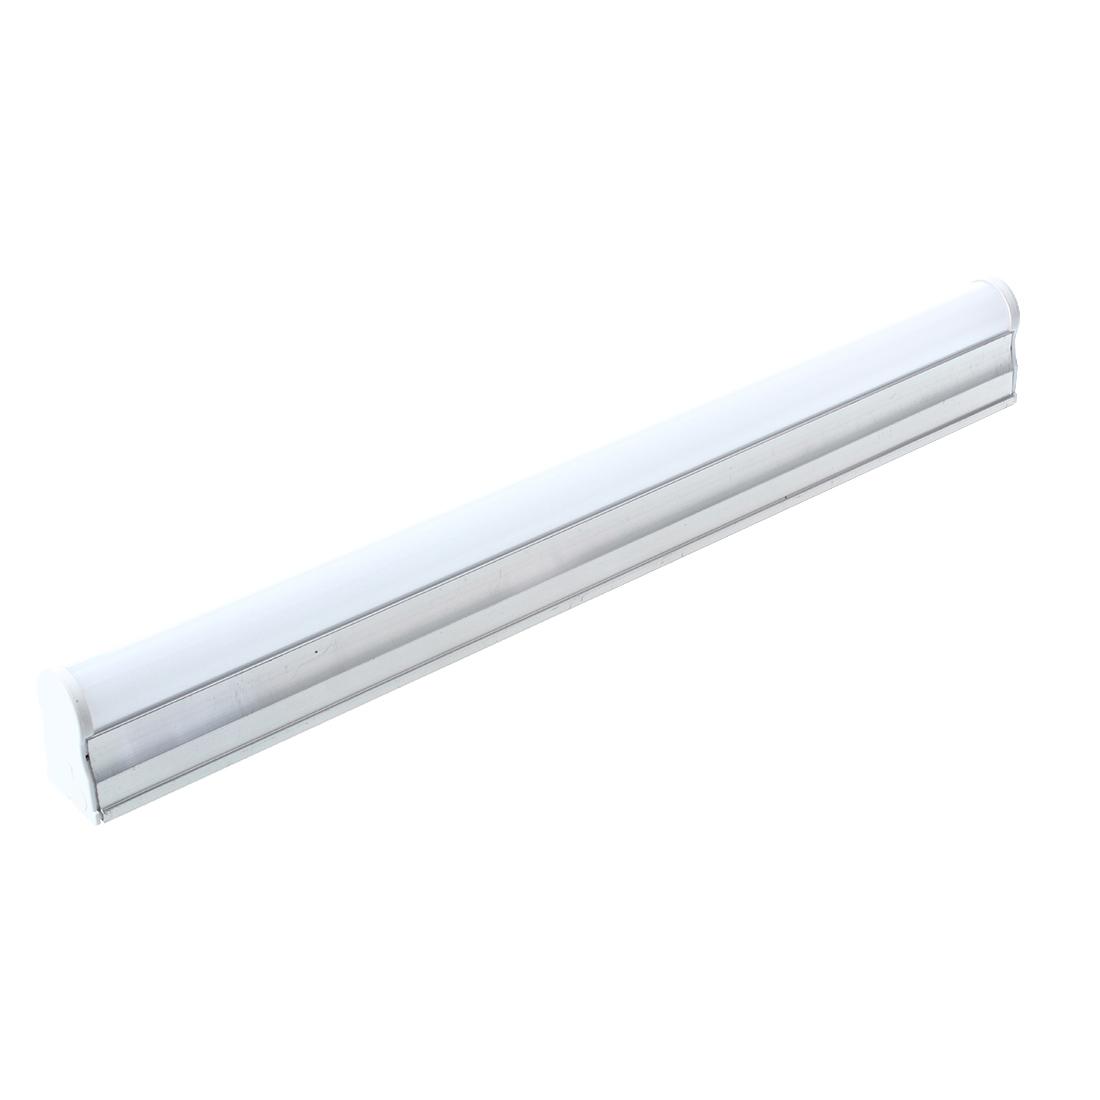 t5 4w 40 led 2835 smd tube light fluorescent lamp ac90. Black Bedroom Furniture Sets. Home Design Ideas